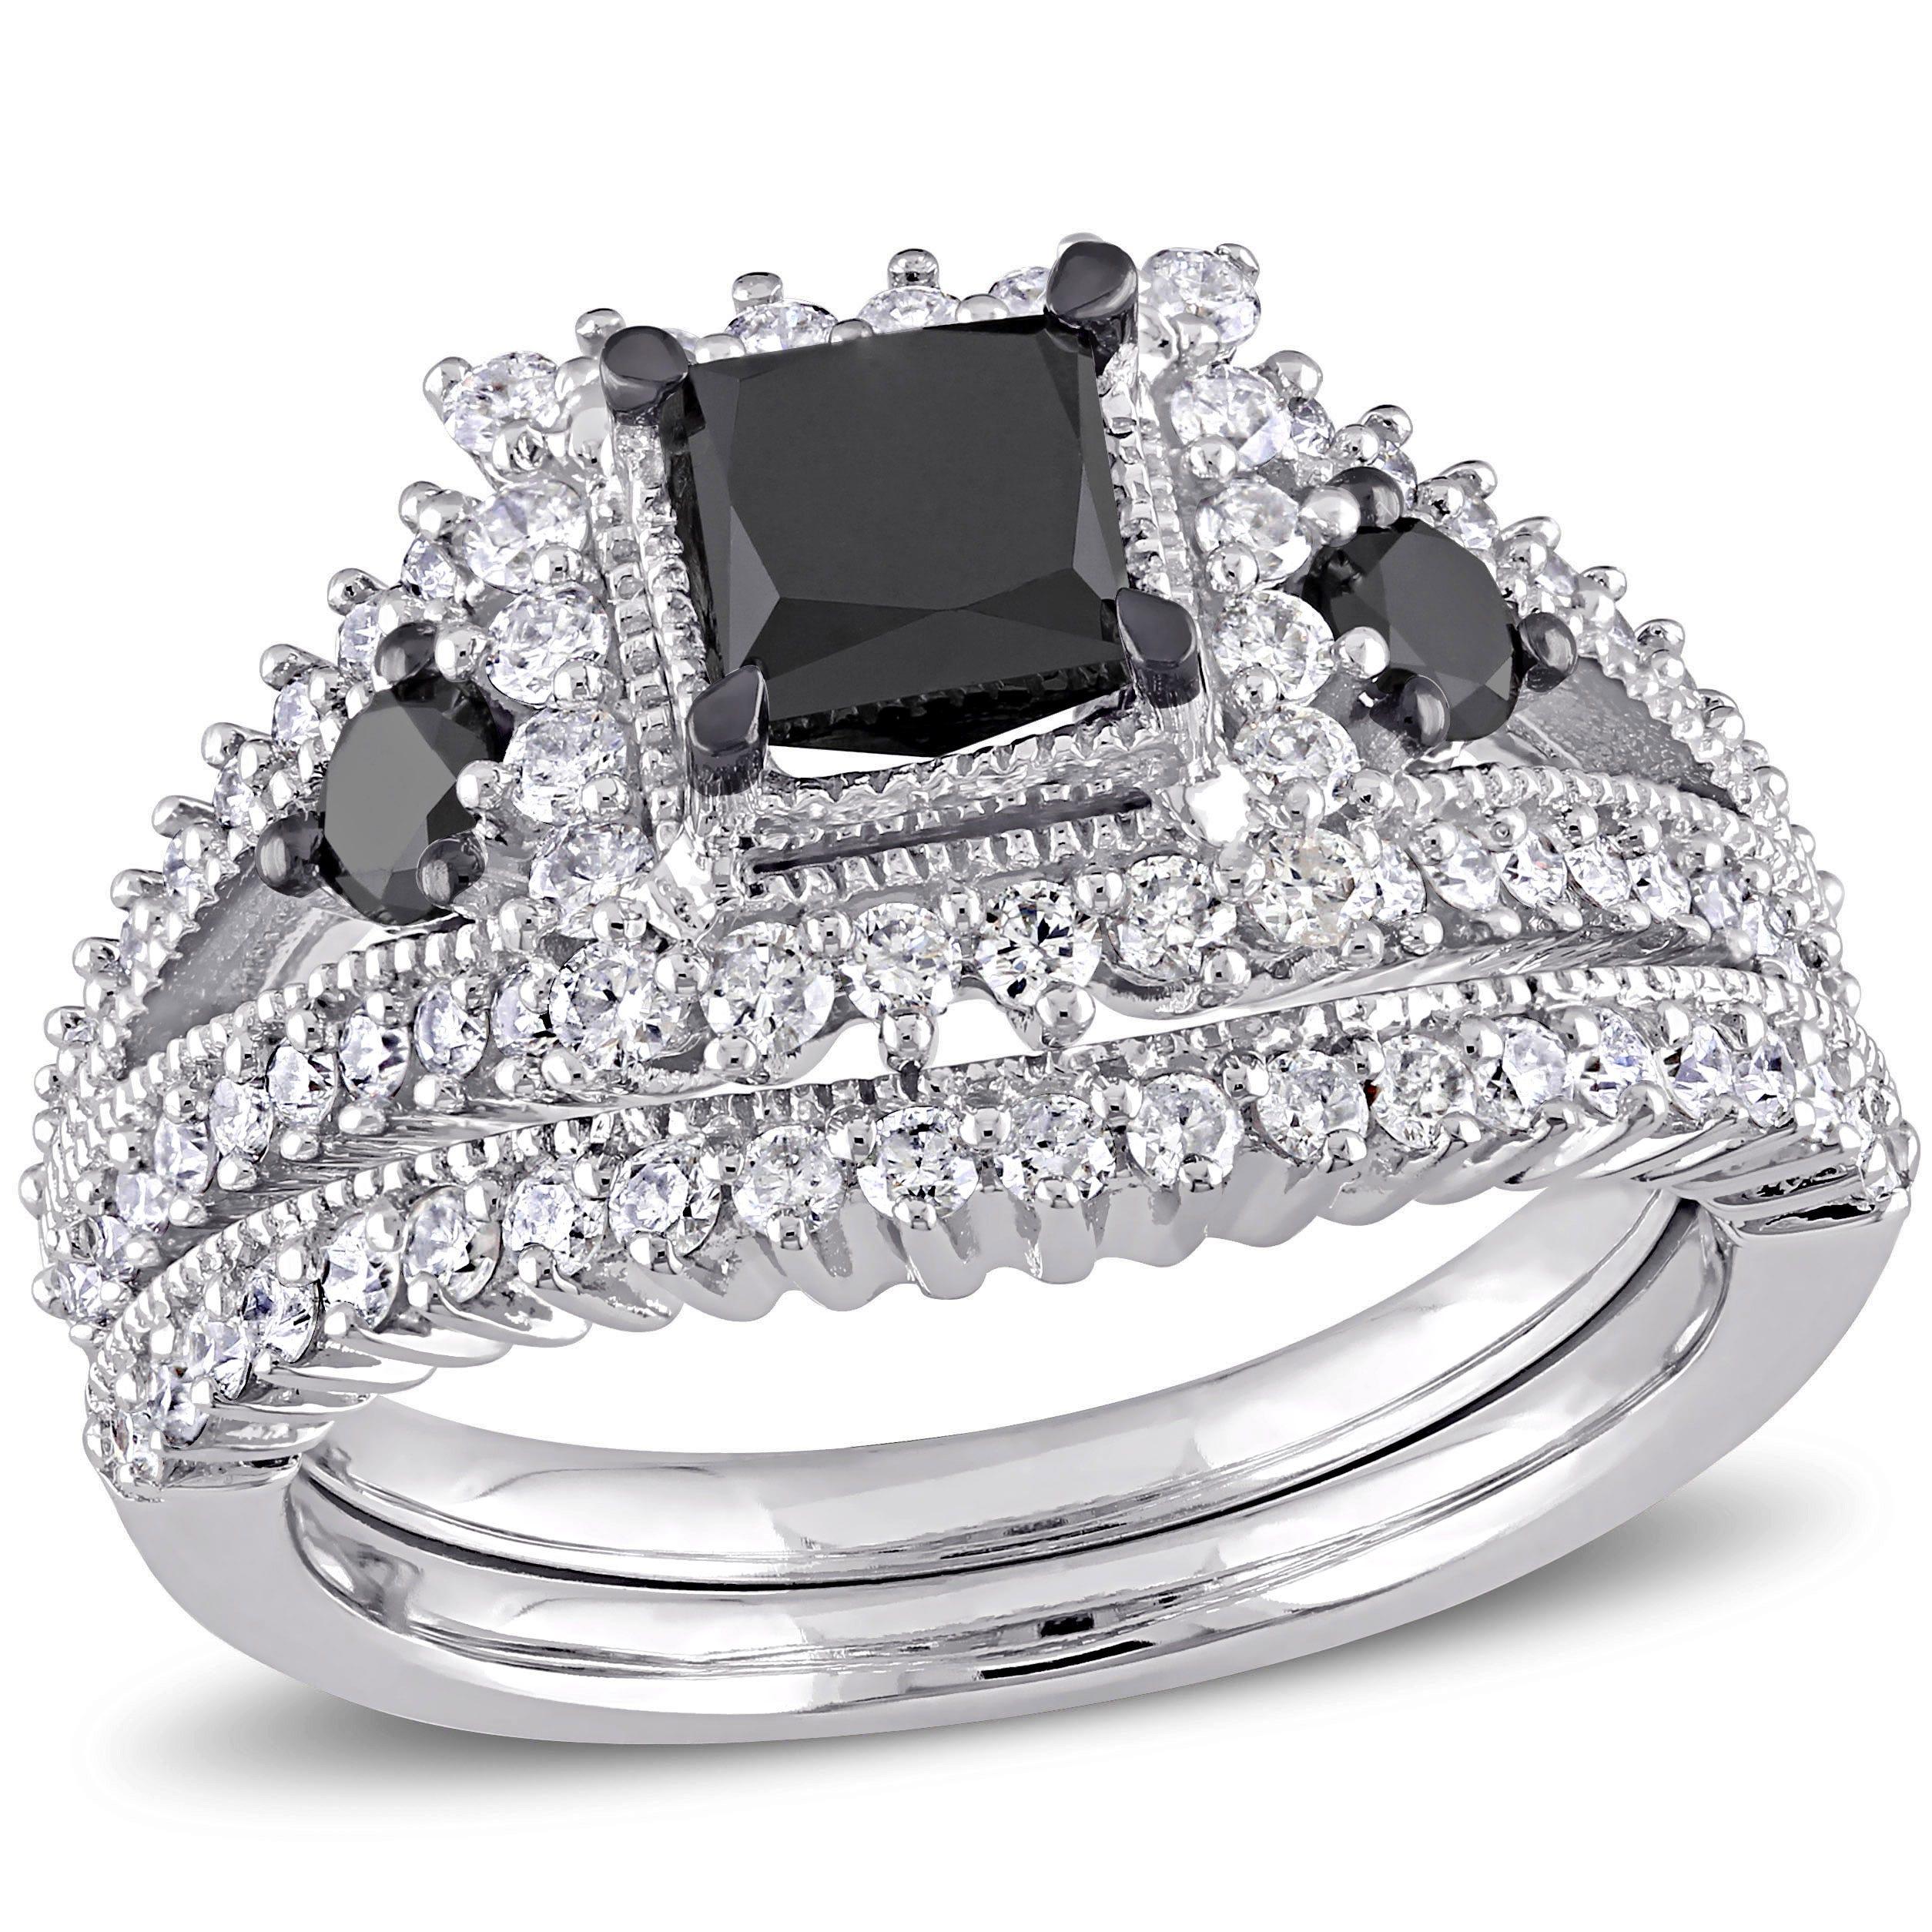 Black Princess-Cut Diamond With Halo 2ctw. Engagement Ring + Matching Wedding Band